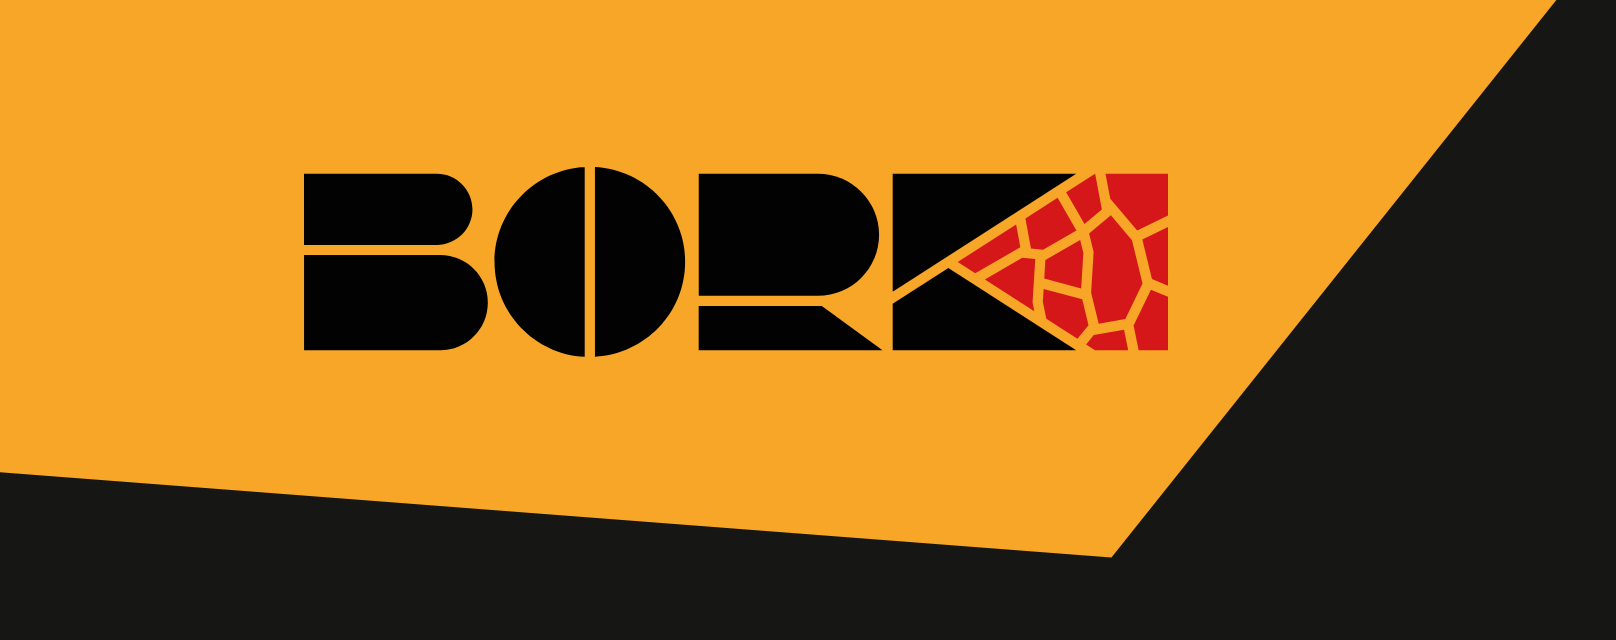 Bork logo